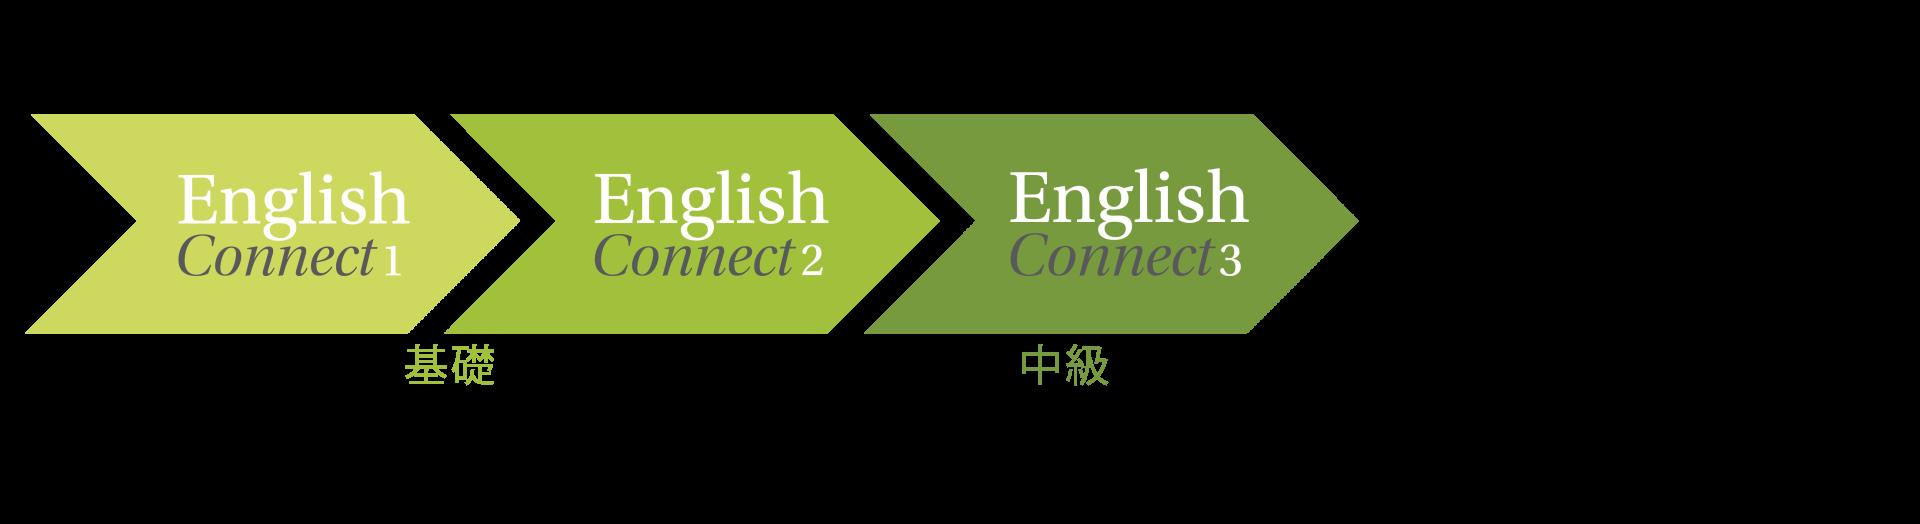 EnglishConnect>形箭號圖示